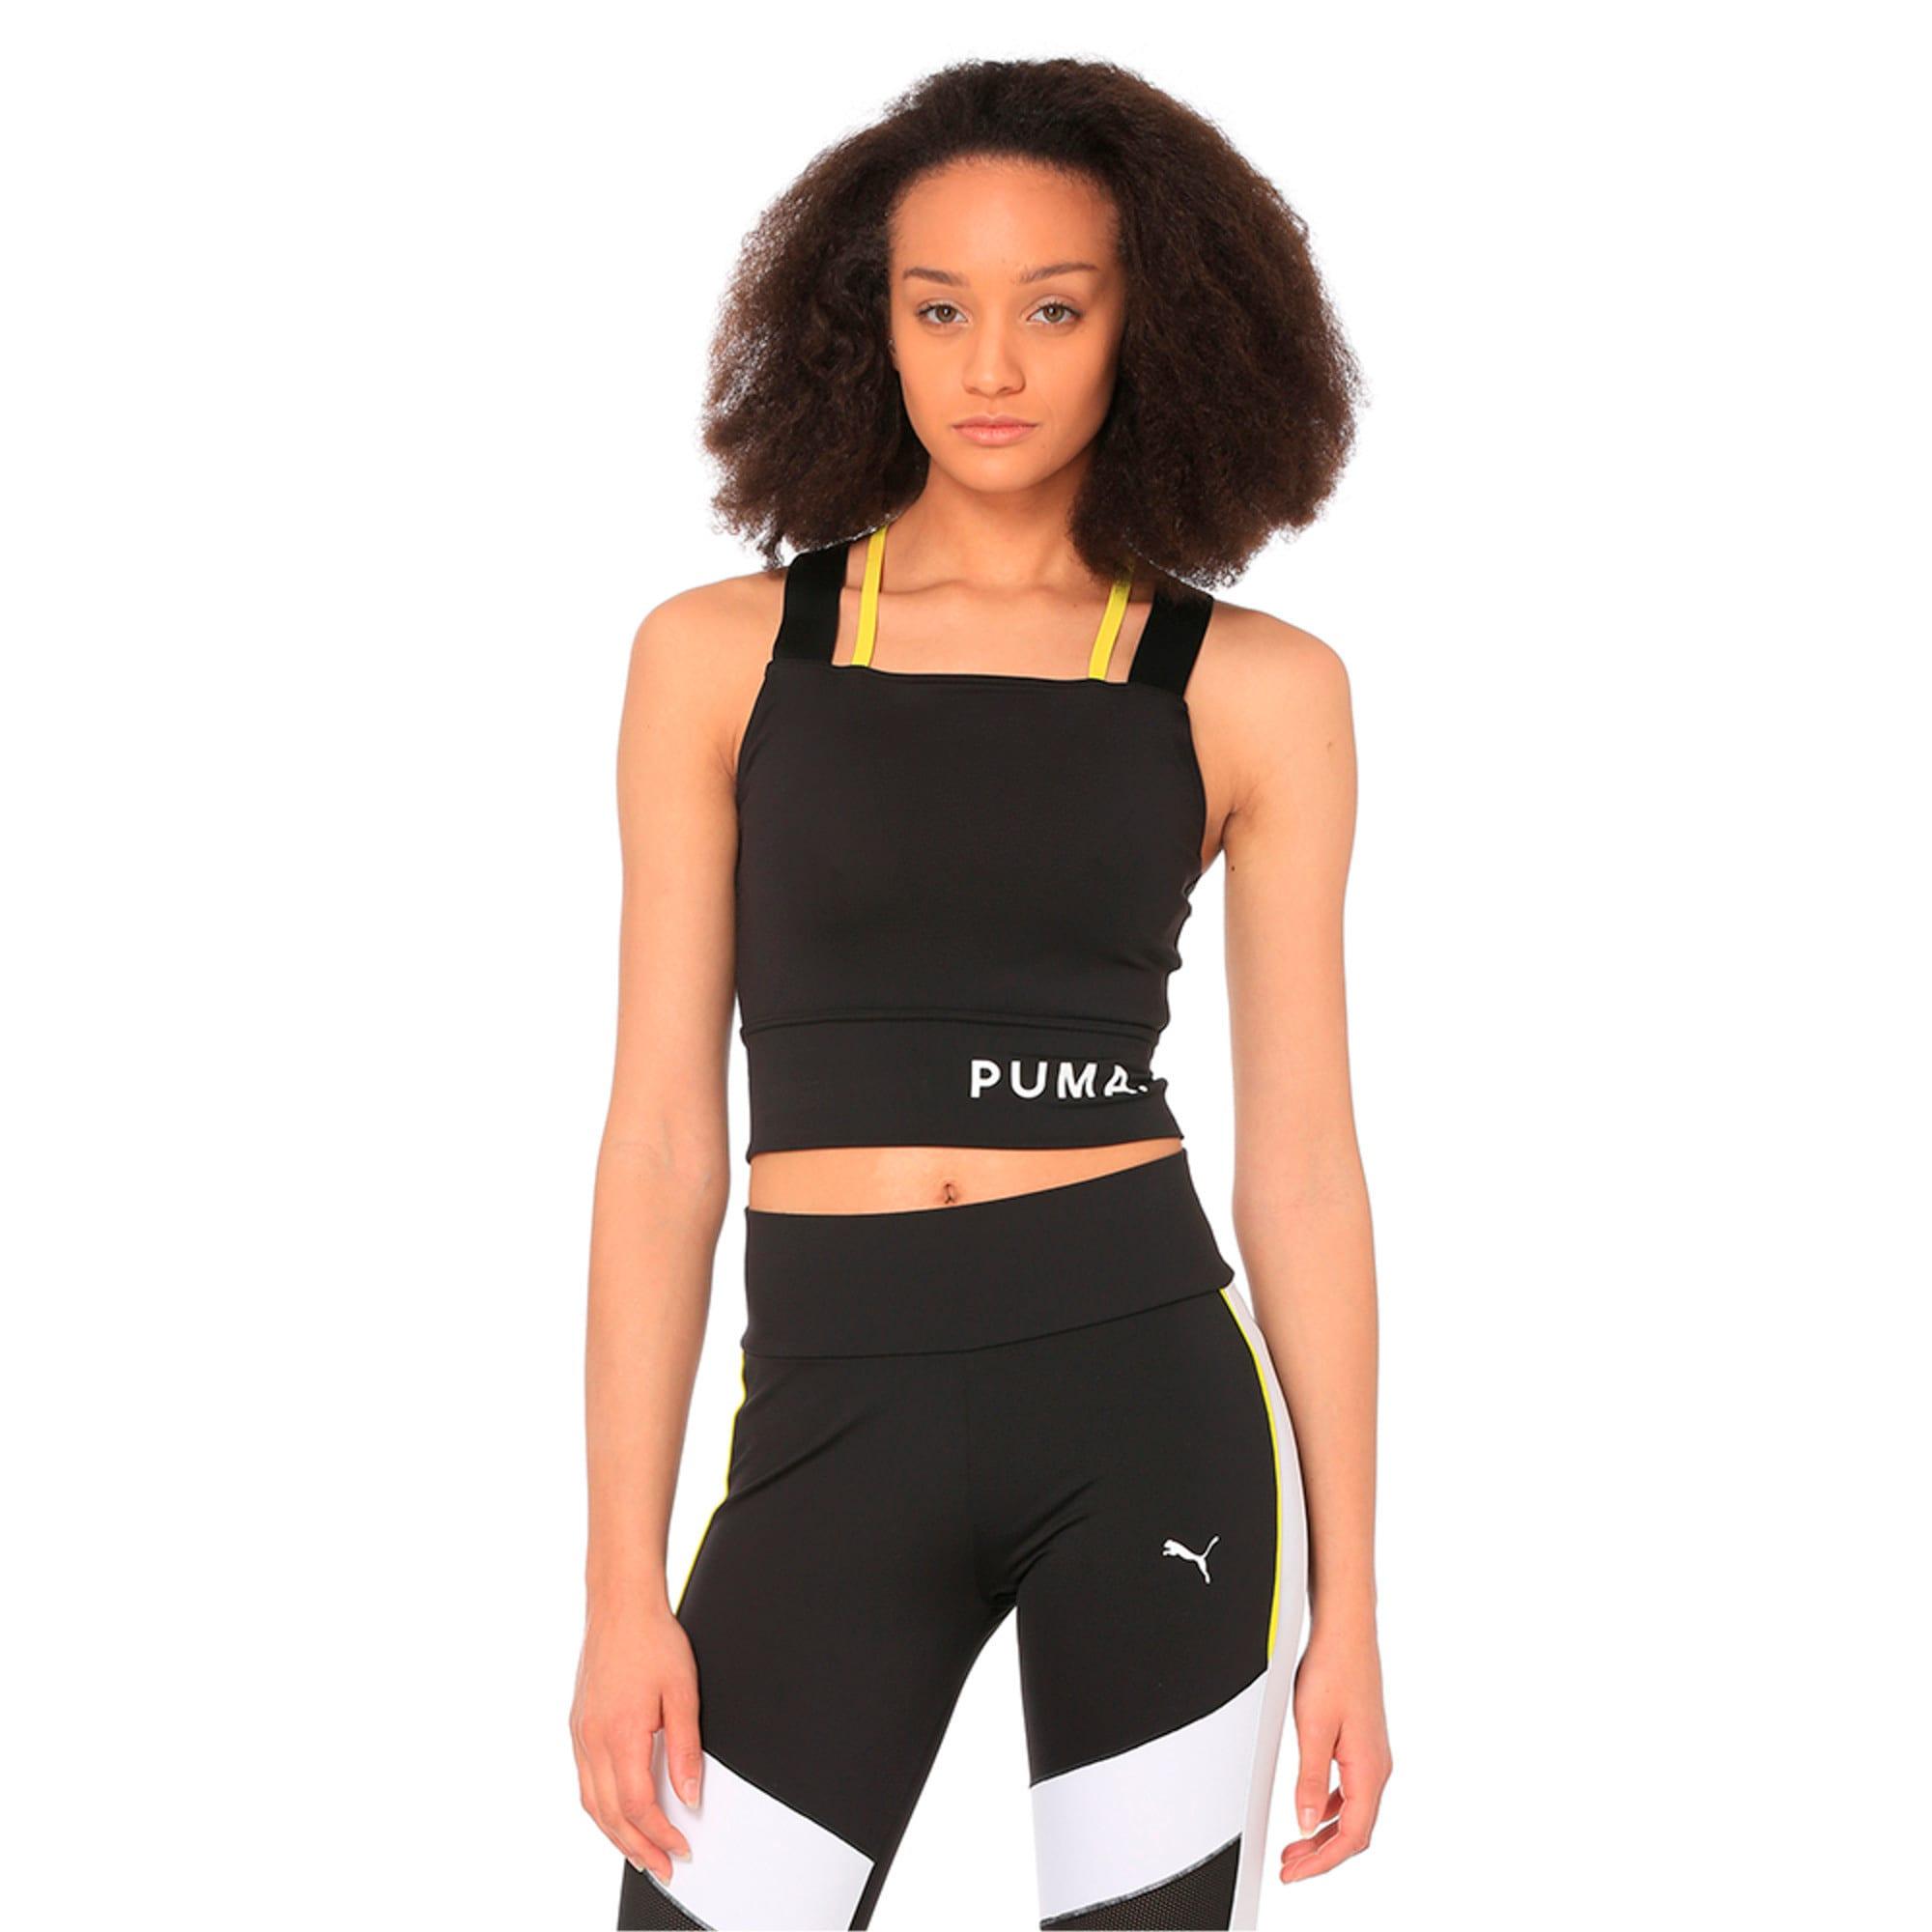 Thumbnail 1 of Chase Women's Crop Top, Puma Black, medium-IND